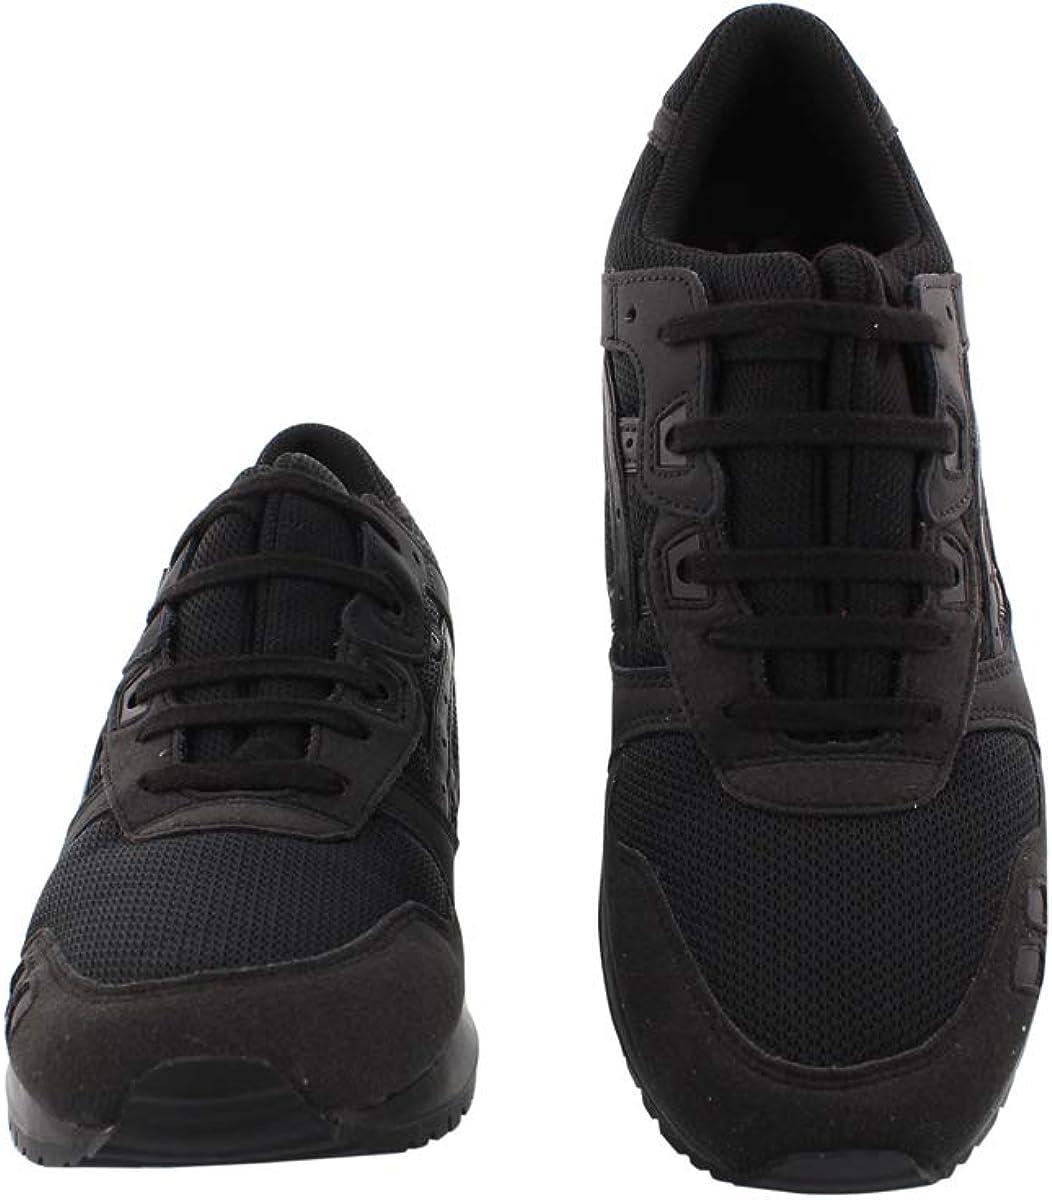 grueso Recientemente póngase en fila  ASICS Tiger Men's Gel-Lyte III Shoes, 10M, Black/Black | Road Running -  Amazon.com